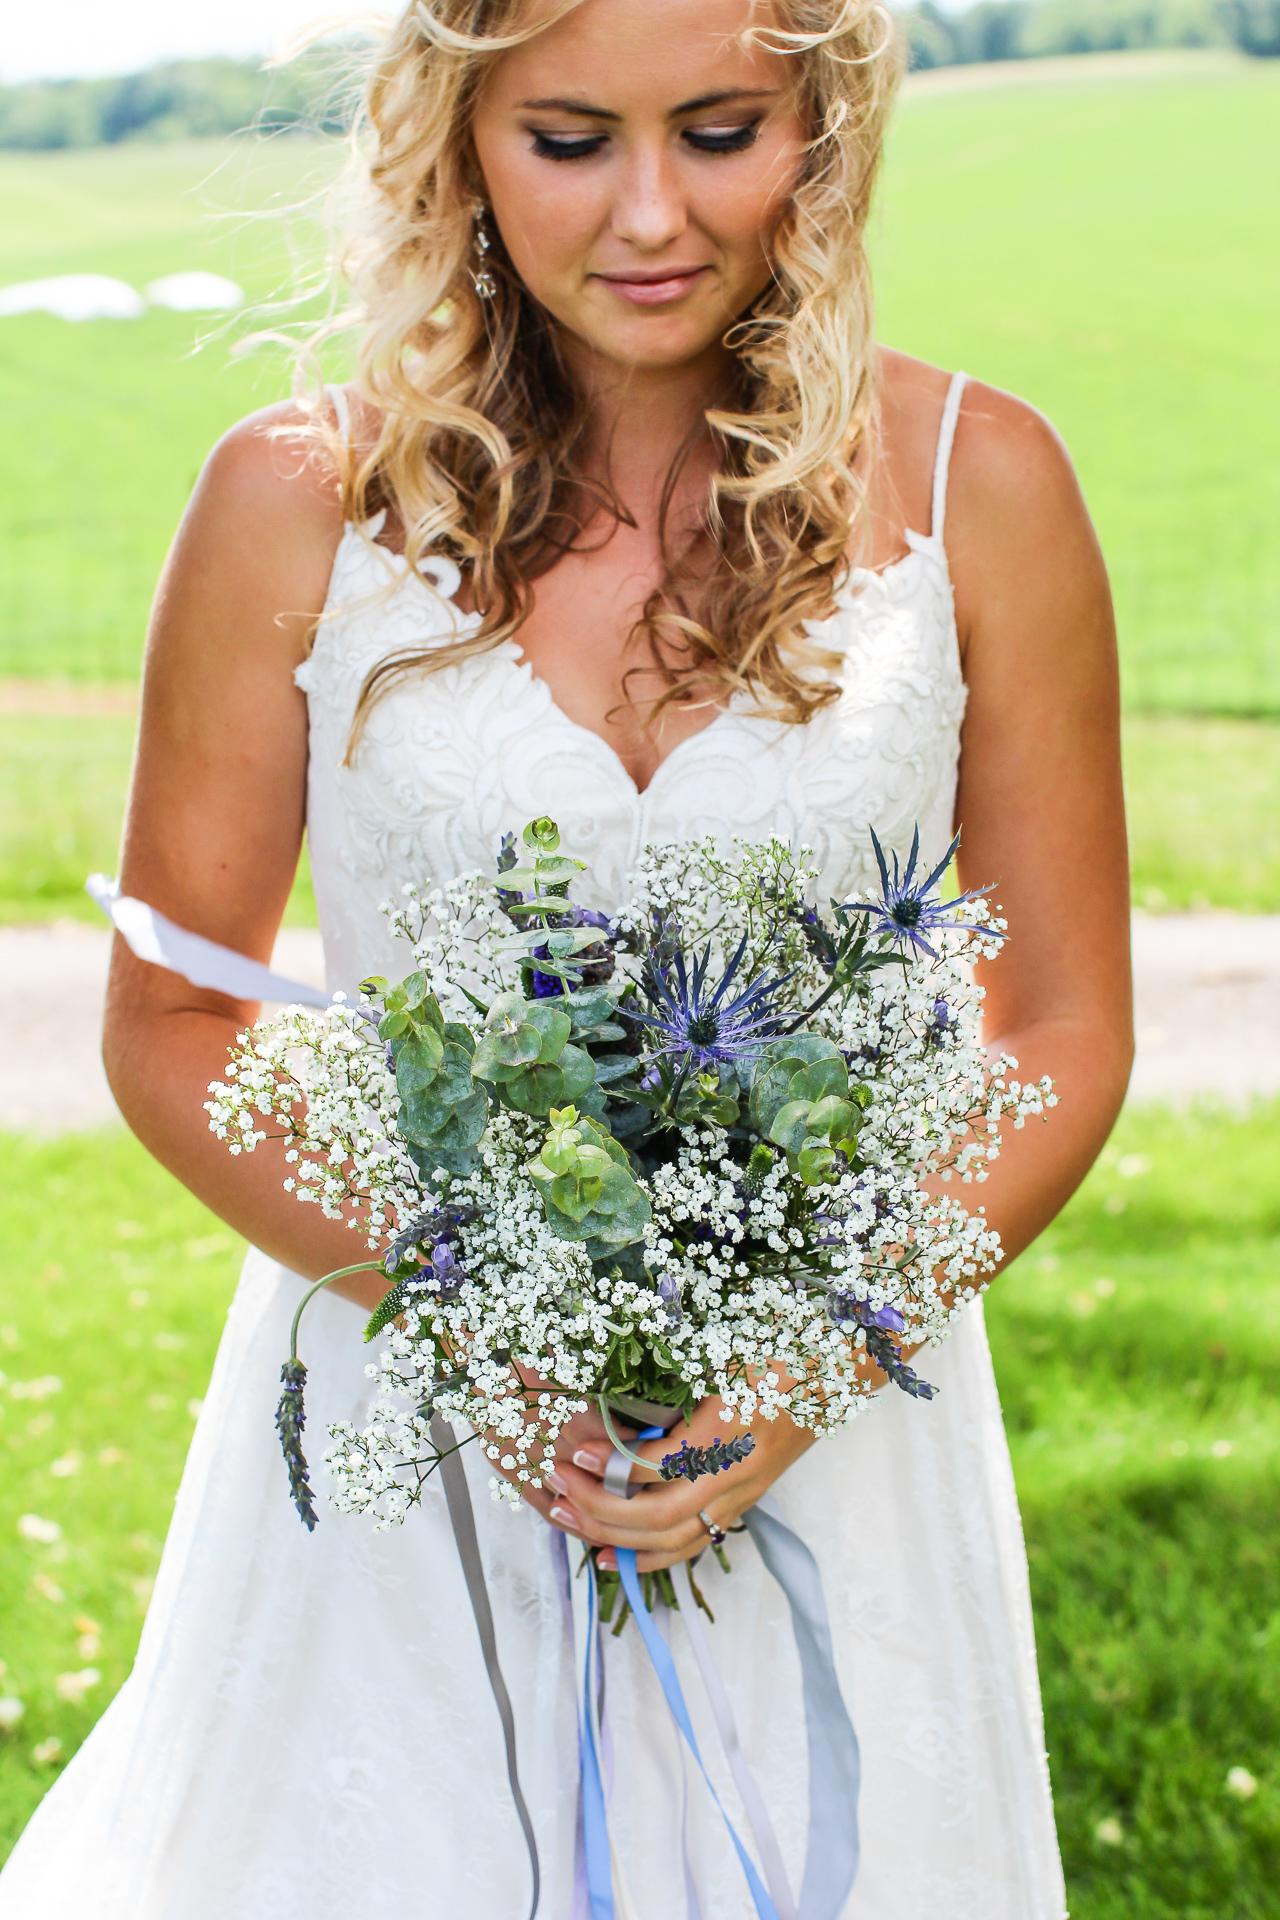 Jordan + Kevin Wedding On Sunny Slope Farm Wedding Venue by Linda Hexter Photography (11 of 30)